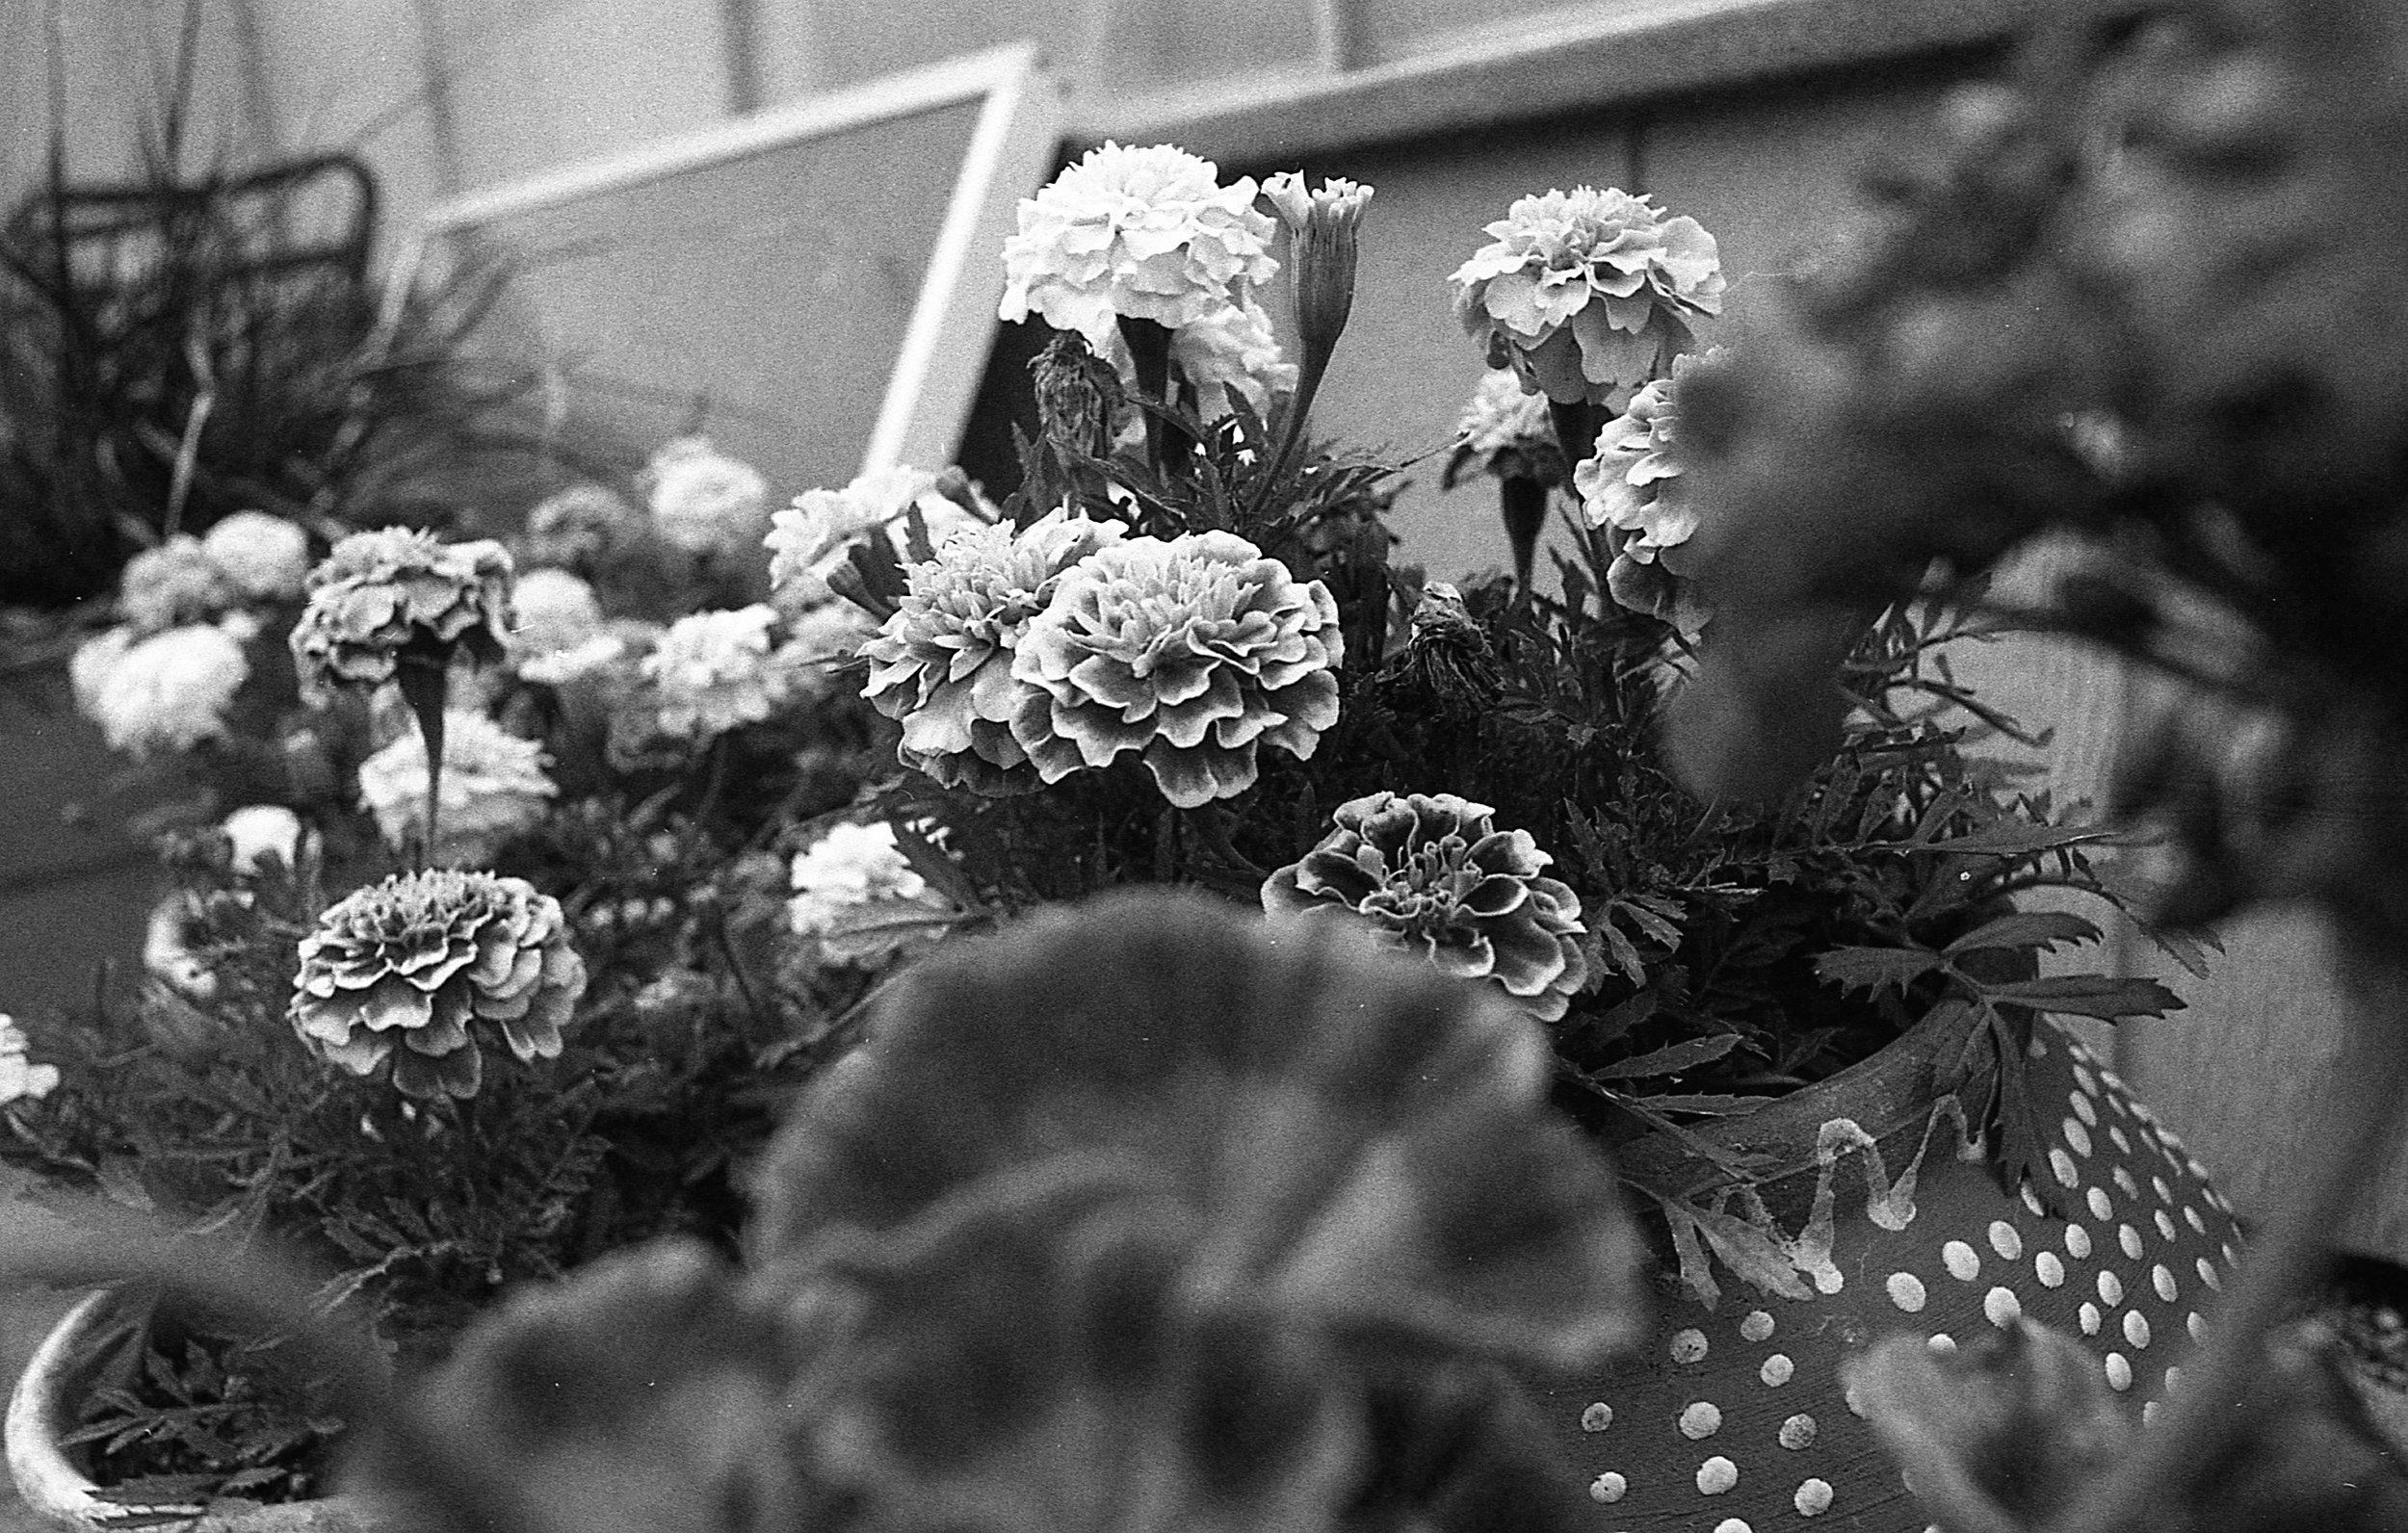 1981 Minolta X-700 Photo 35mm Film Zoe Kissel Garden Flowers